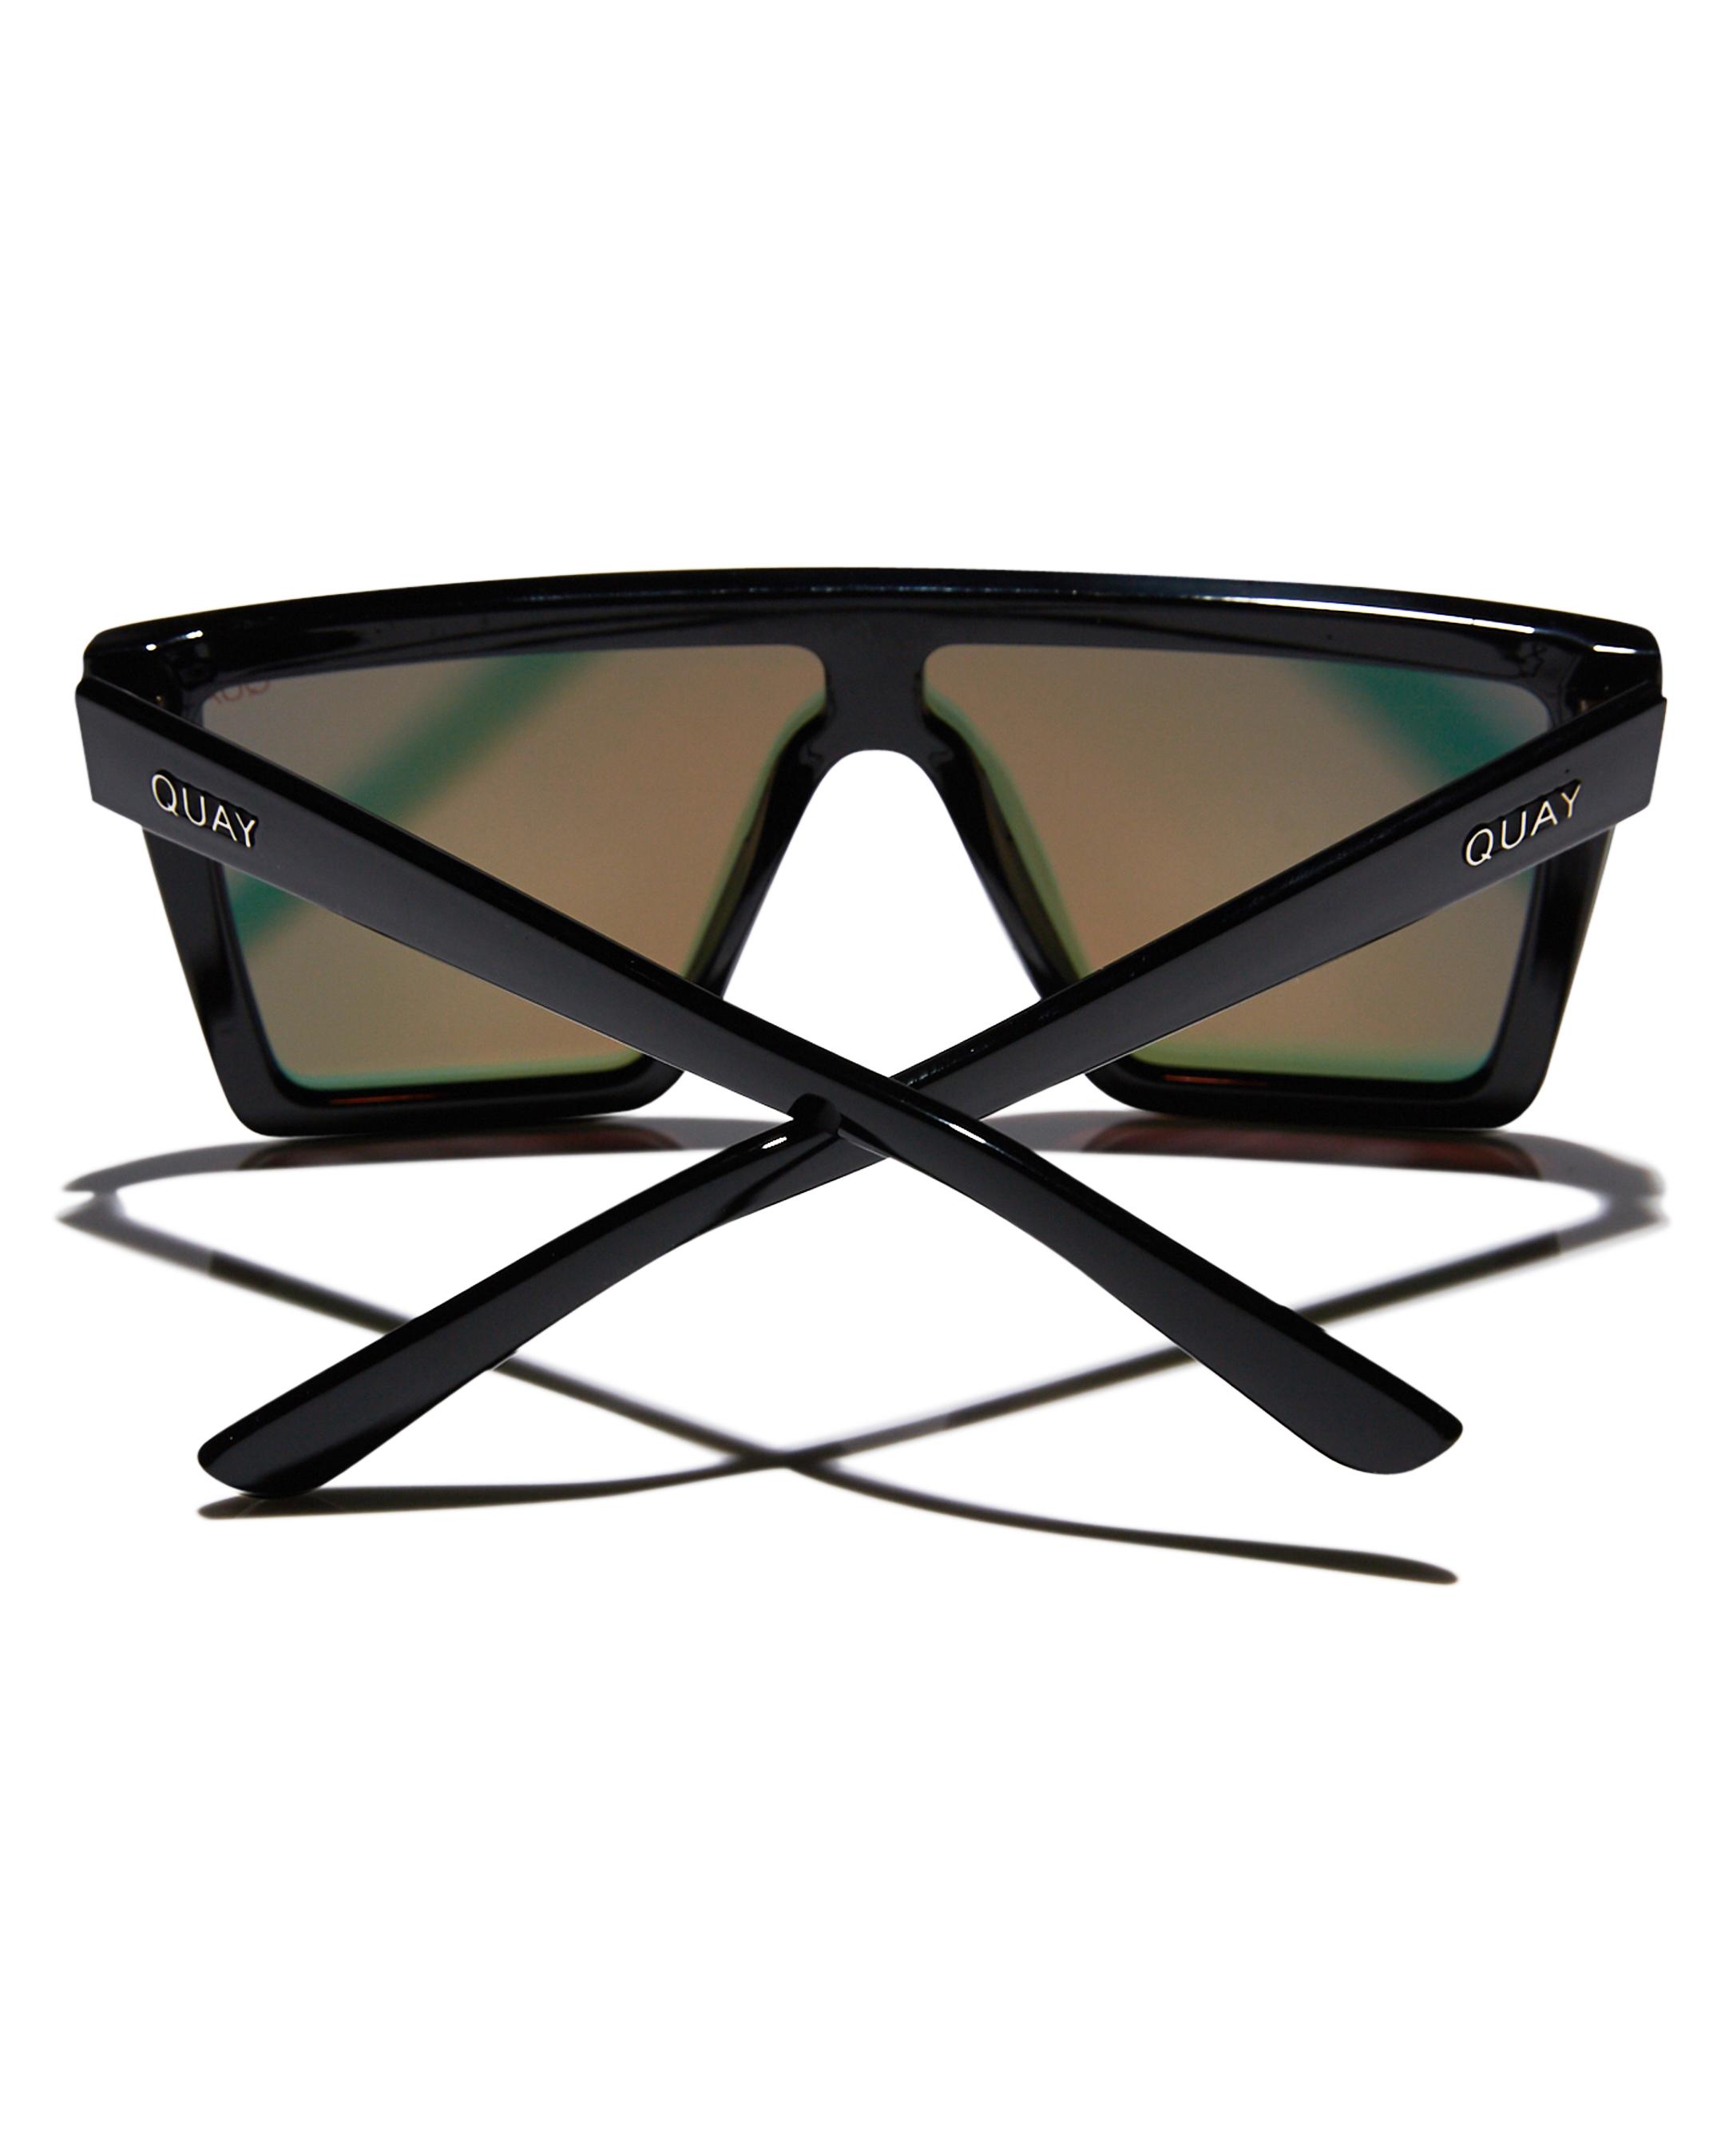 New-Quay-Eyewear-Women-039-s-Hindsight-Sunglasses-Stainless-Steel-Glass-Pink thumbnail 14